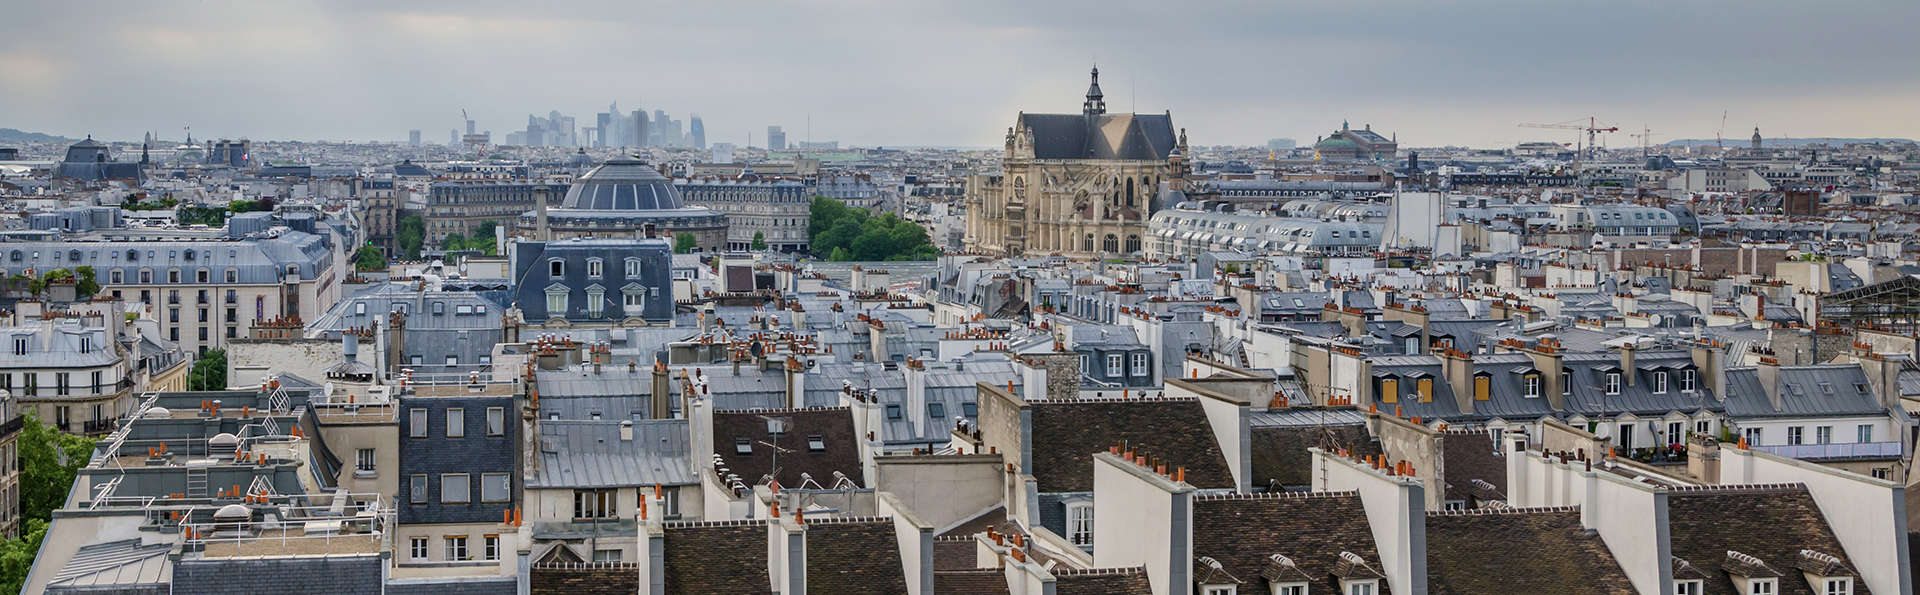 Mercure Paris Ouest Saint-Germain - Edit_SaintGermain3.jpg